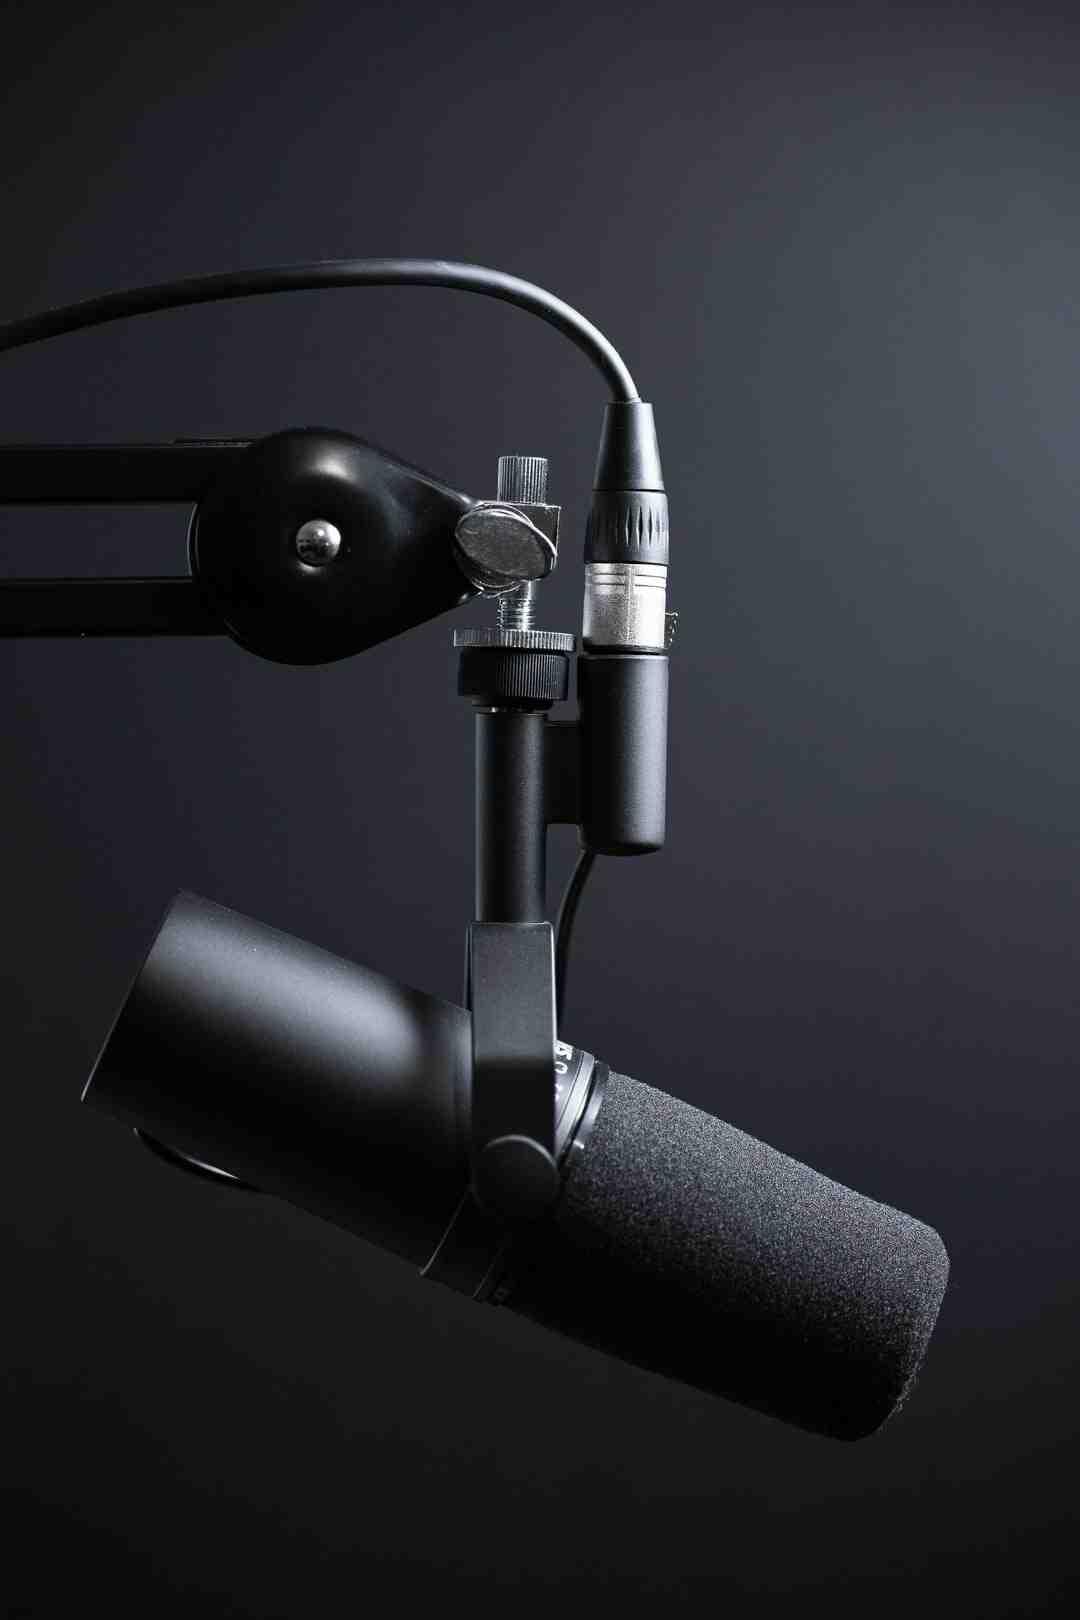 How do I record internal quality audio on a Mac?